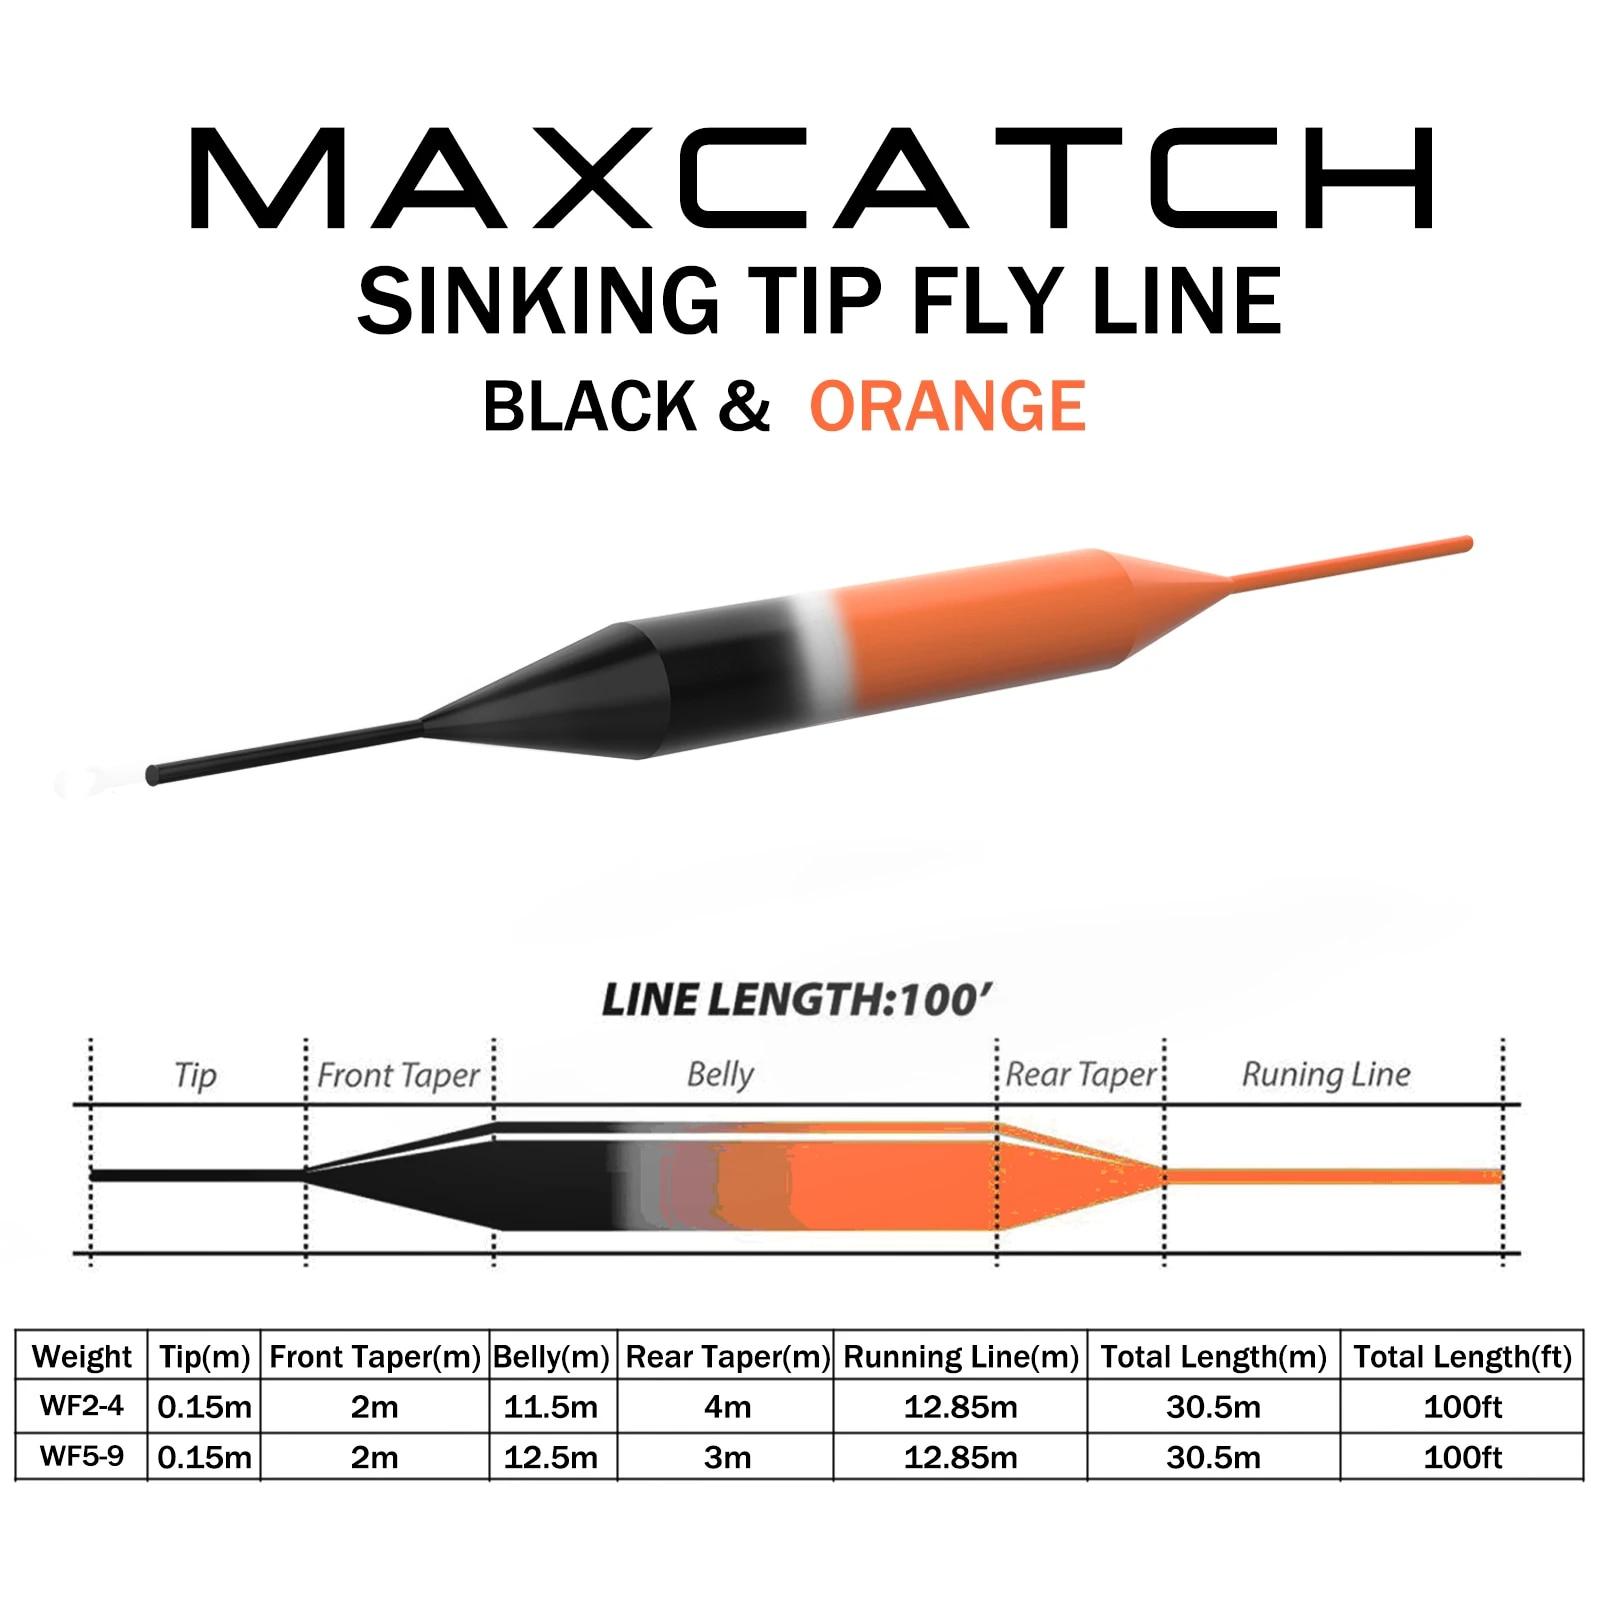 https://ae01.alicdn.com/kf/H8072b33aedcd46dc85aea735c85df1abh/L-nea-de-pesca-con-mosca-Maximumcatch-l-nea-de-mosca-flotante-de-100-pies-con.jpg_Q90.jpg_.webp